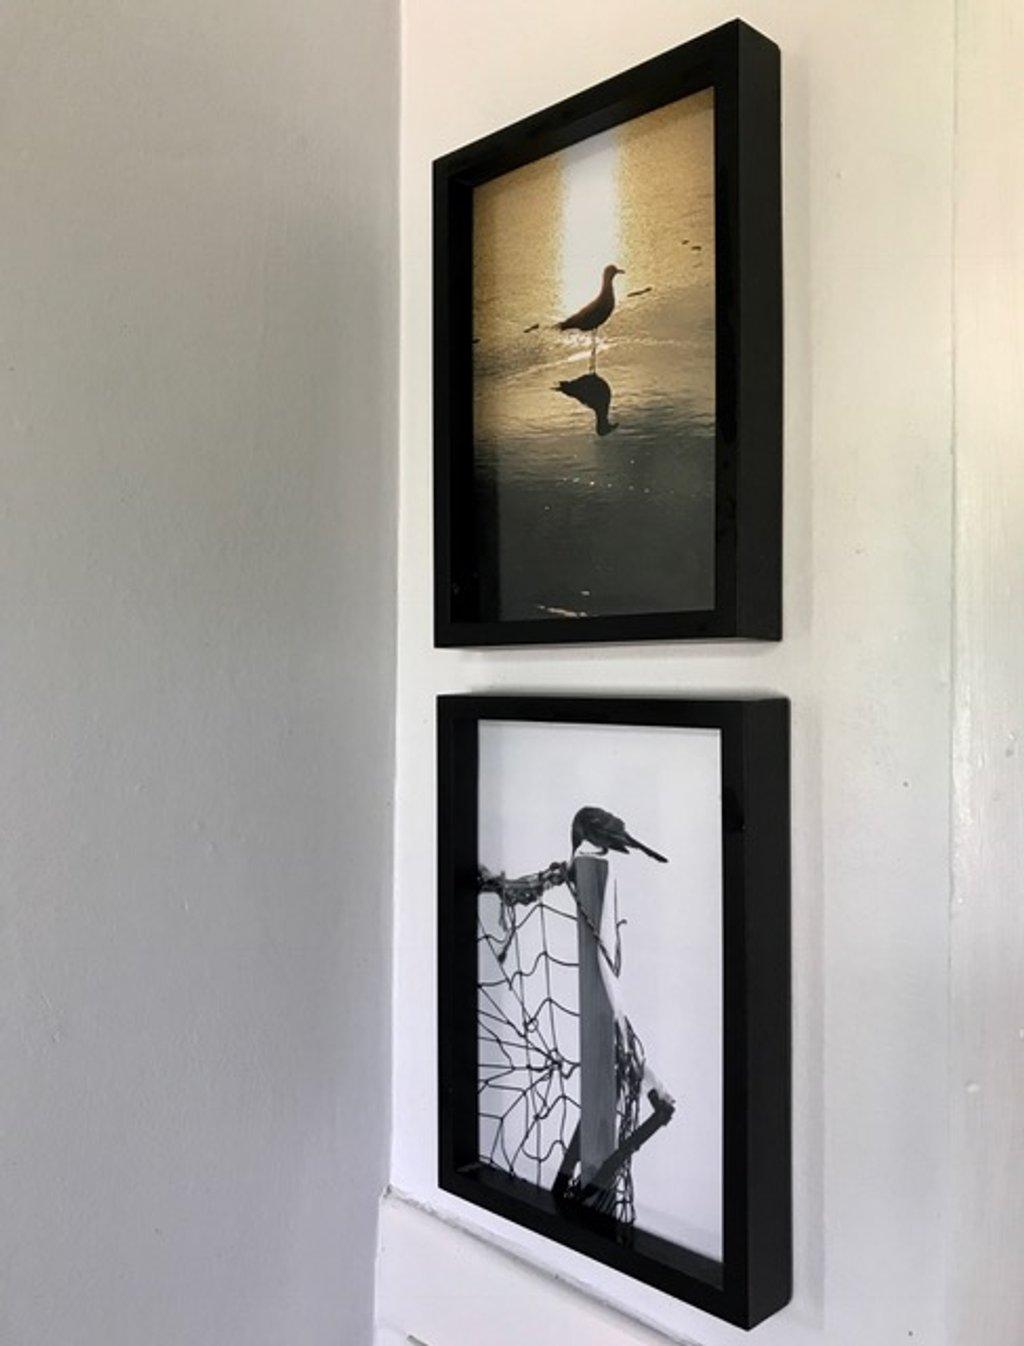 Birds on the wall by joemuli